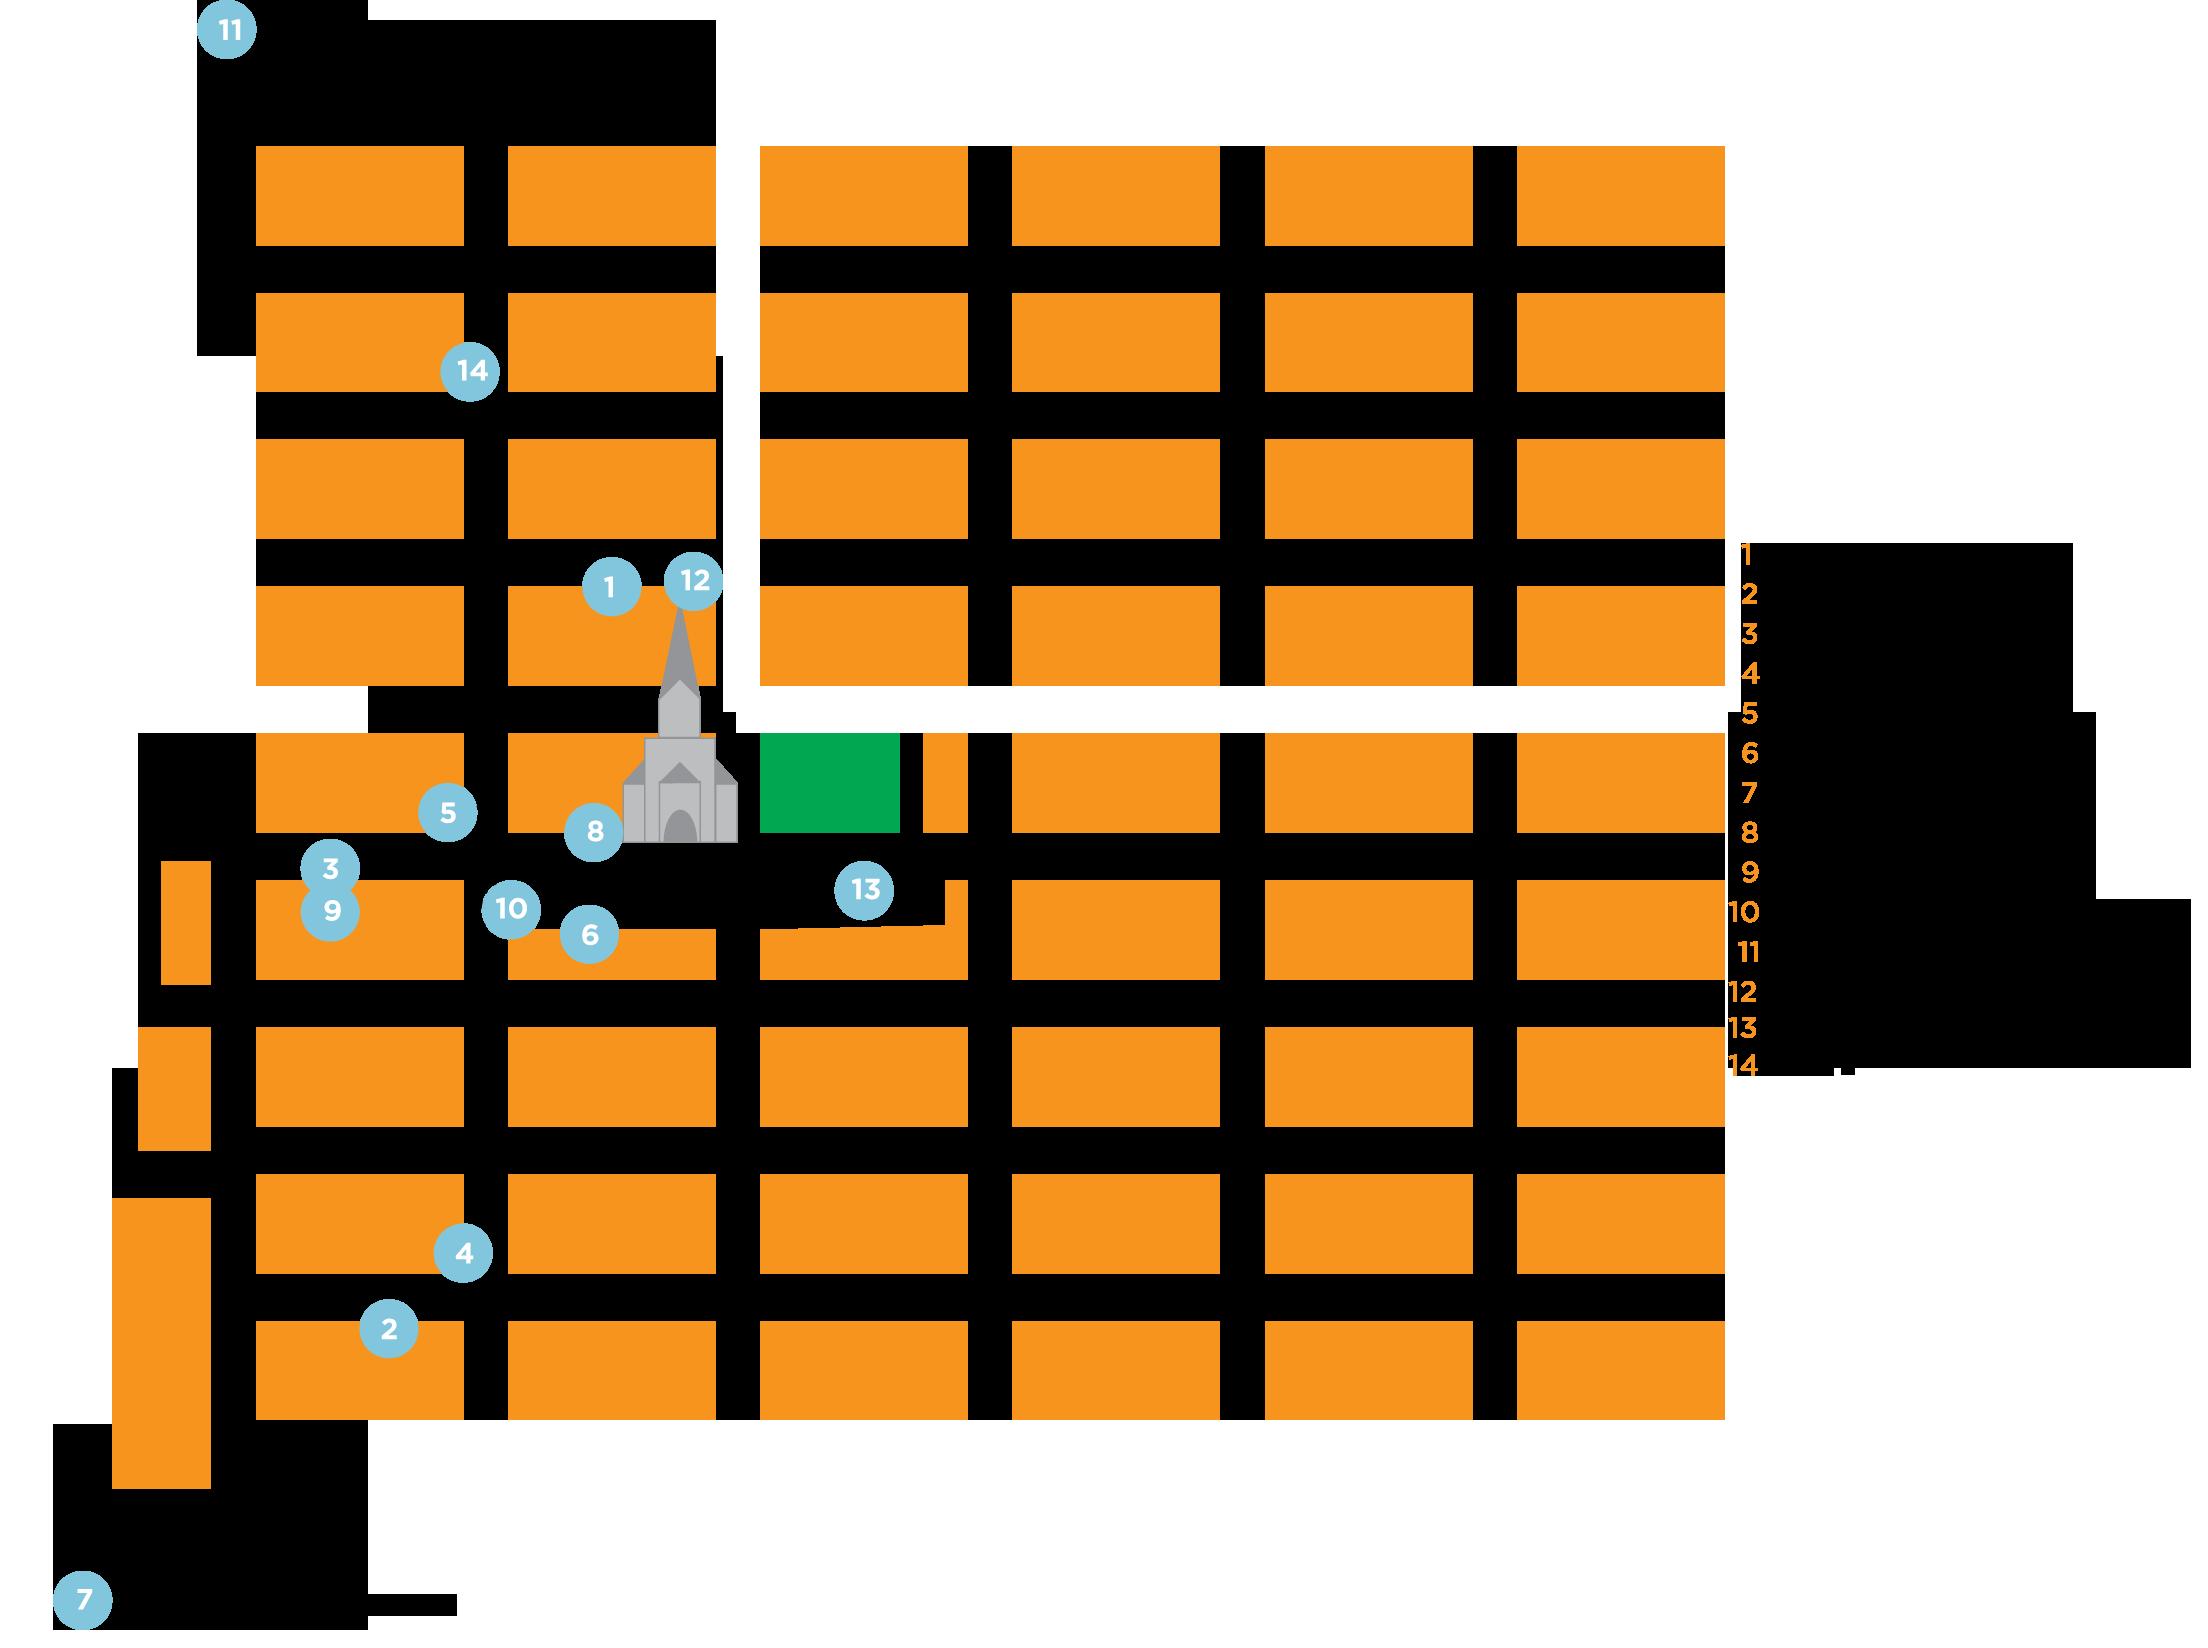 kart kvadraturen Kart Kulturnatta 2014 – Kulturnatta kart kvadraturen